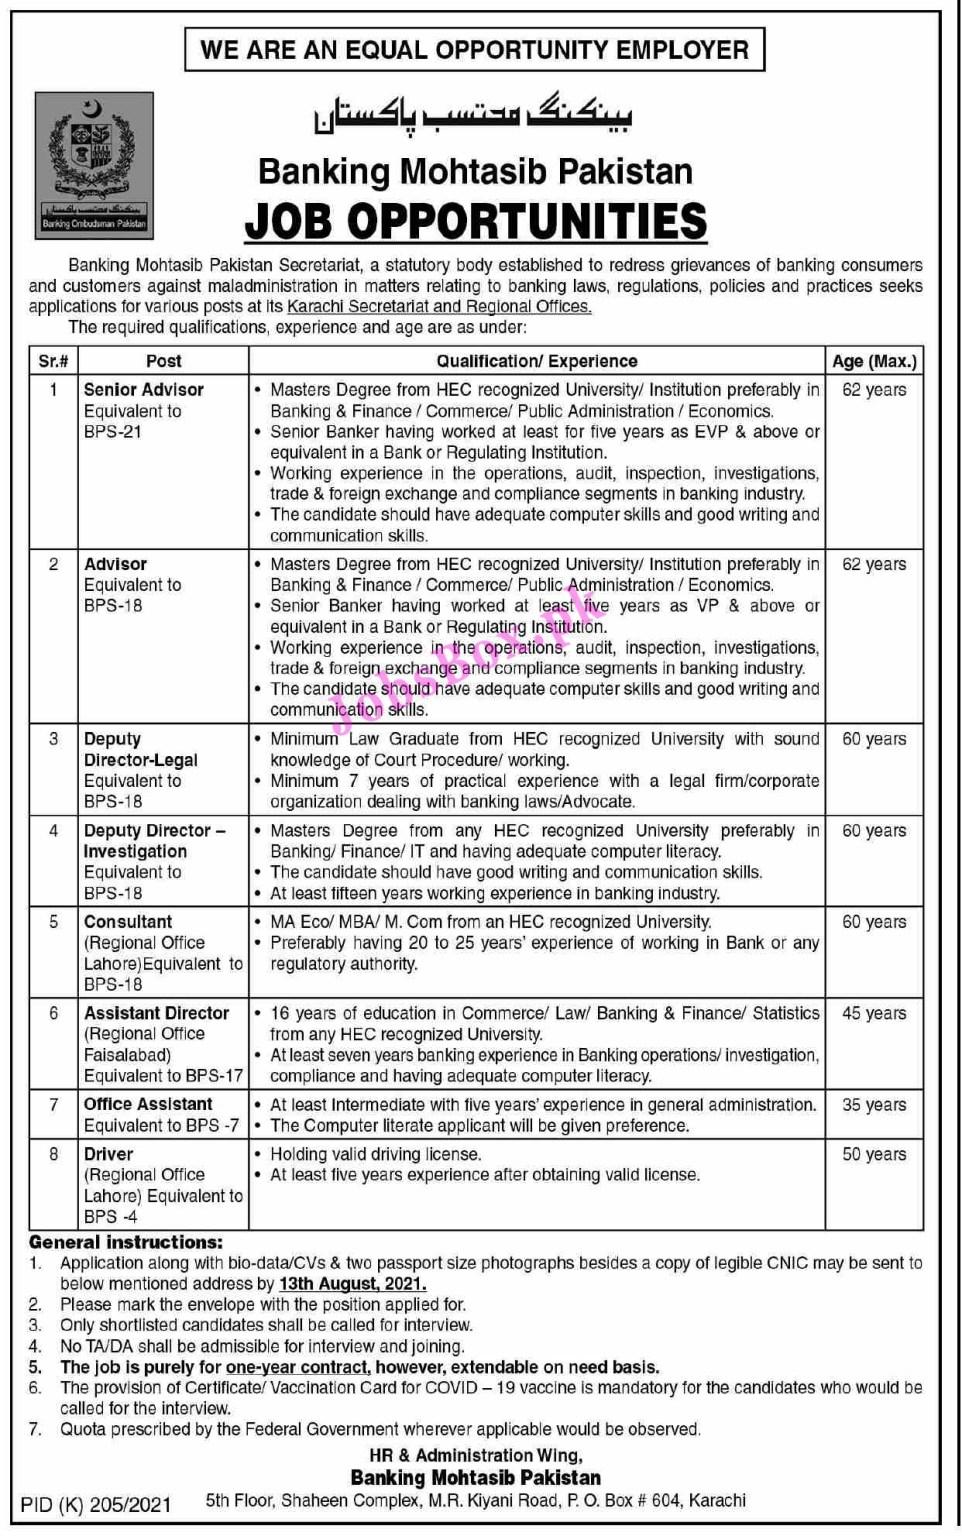 Banking Ombudsman Pakistan Jobs 2021 in Pakistan